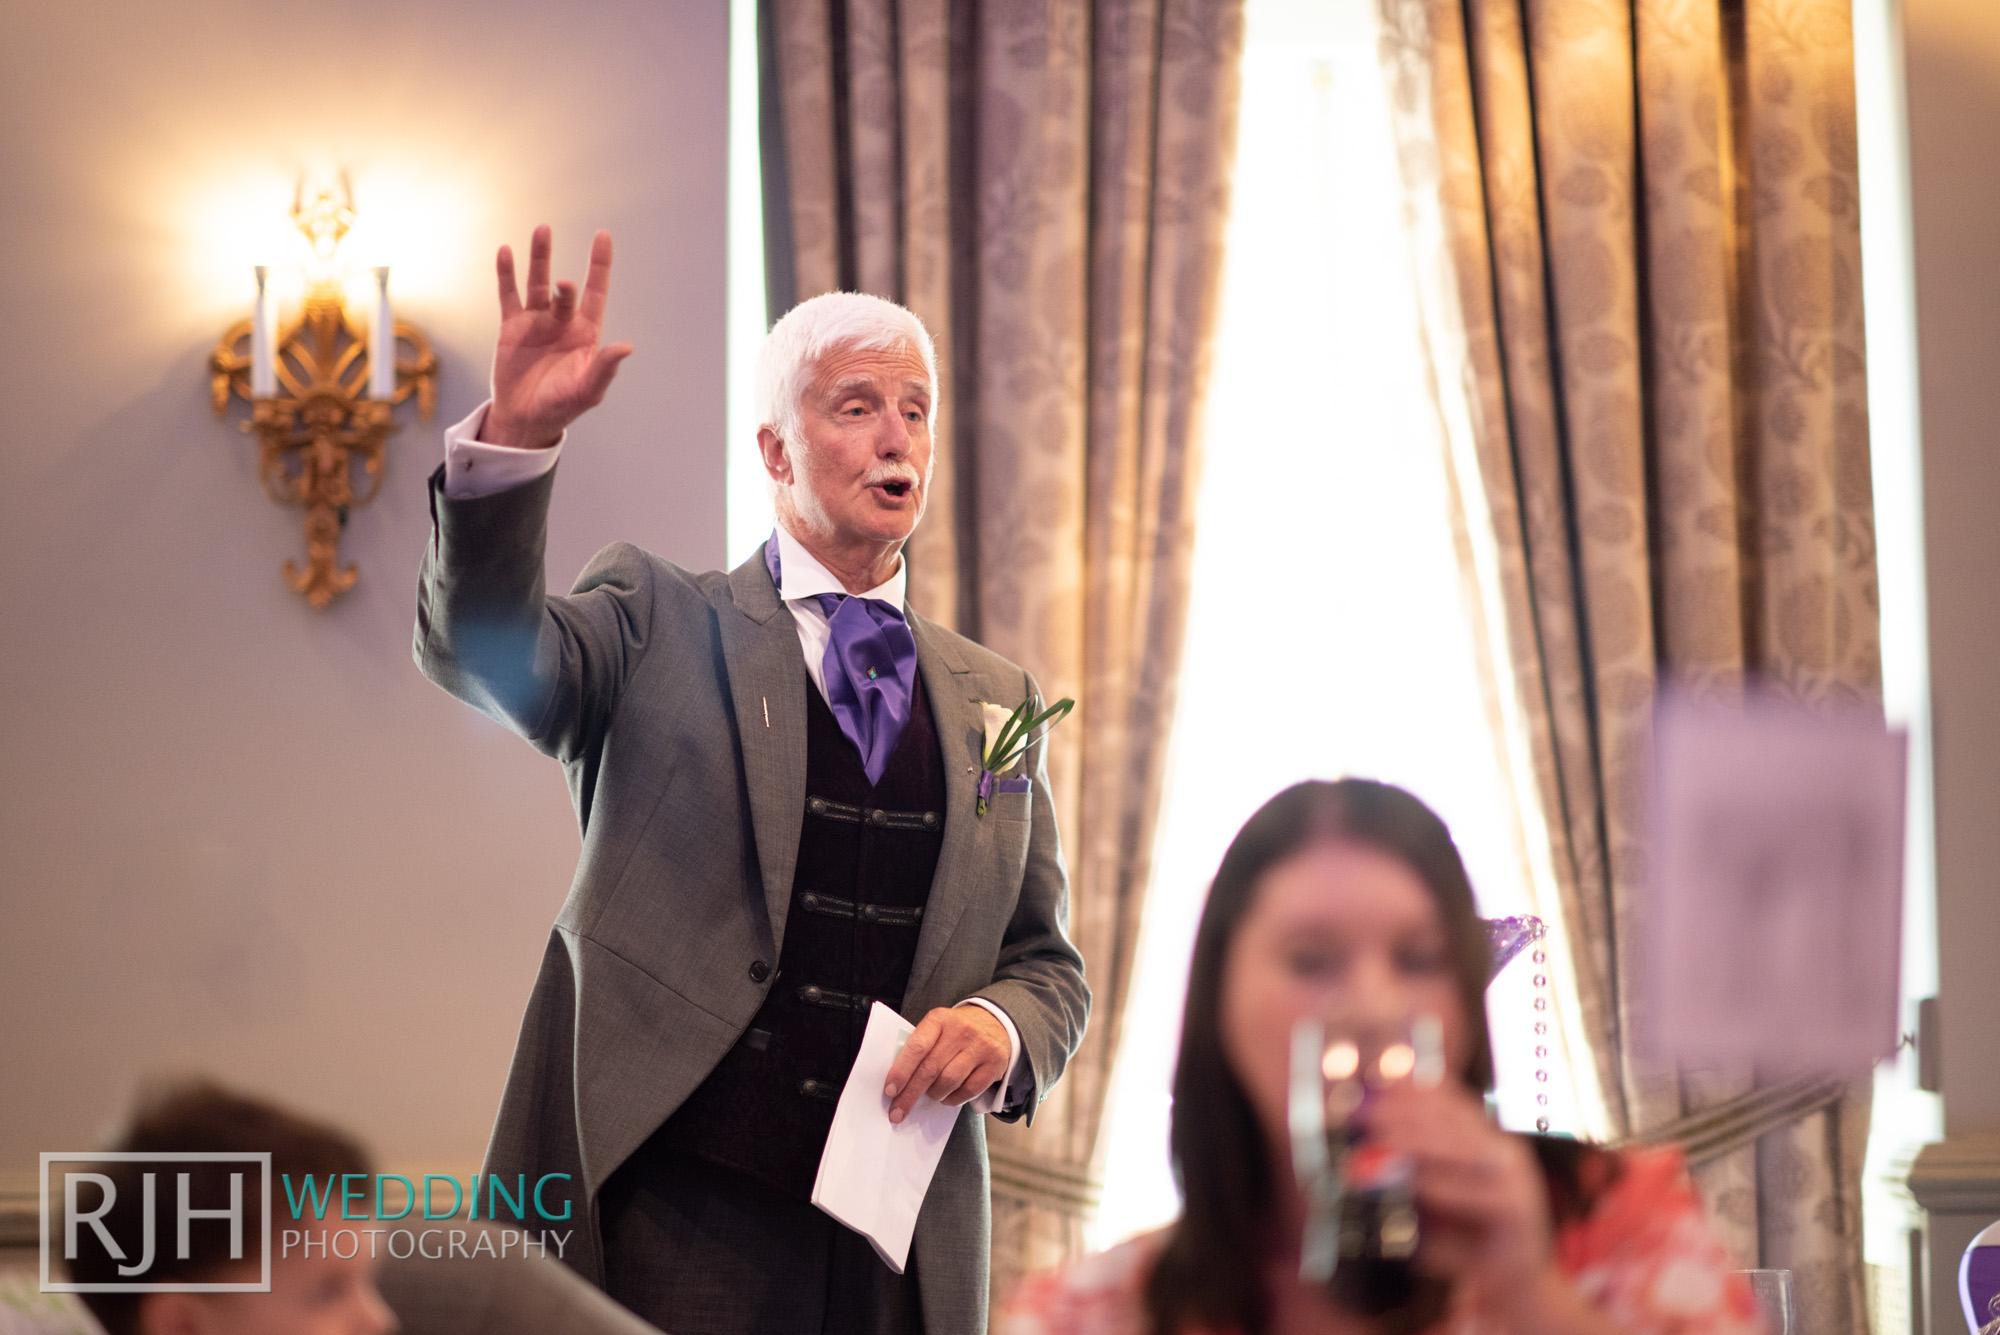 Oulton Hall Wedding Photography_Goodwill-Hall_033_DSC_3804.jpg